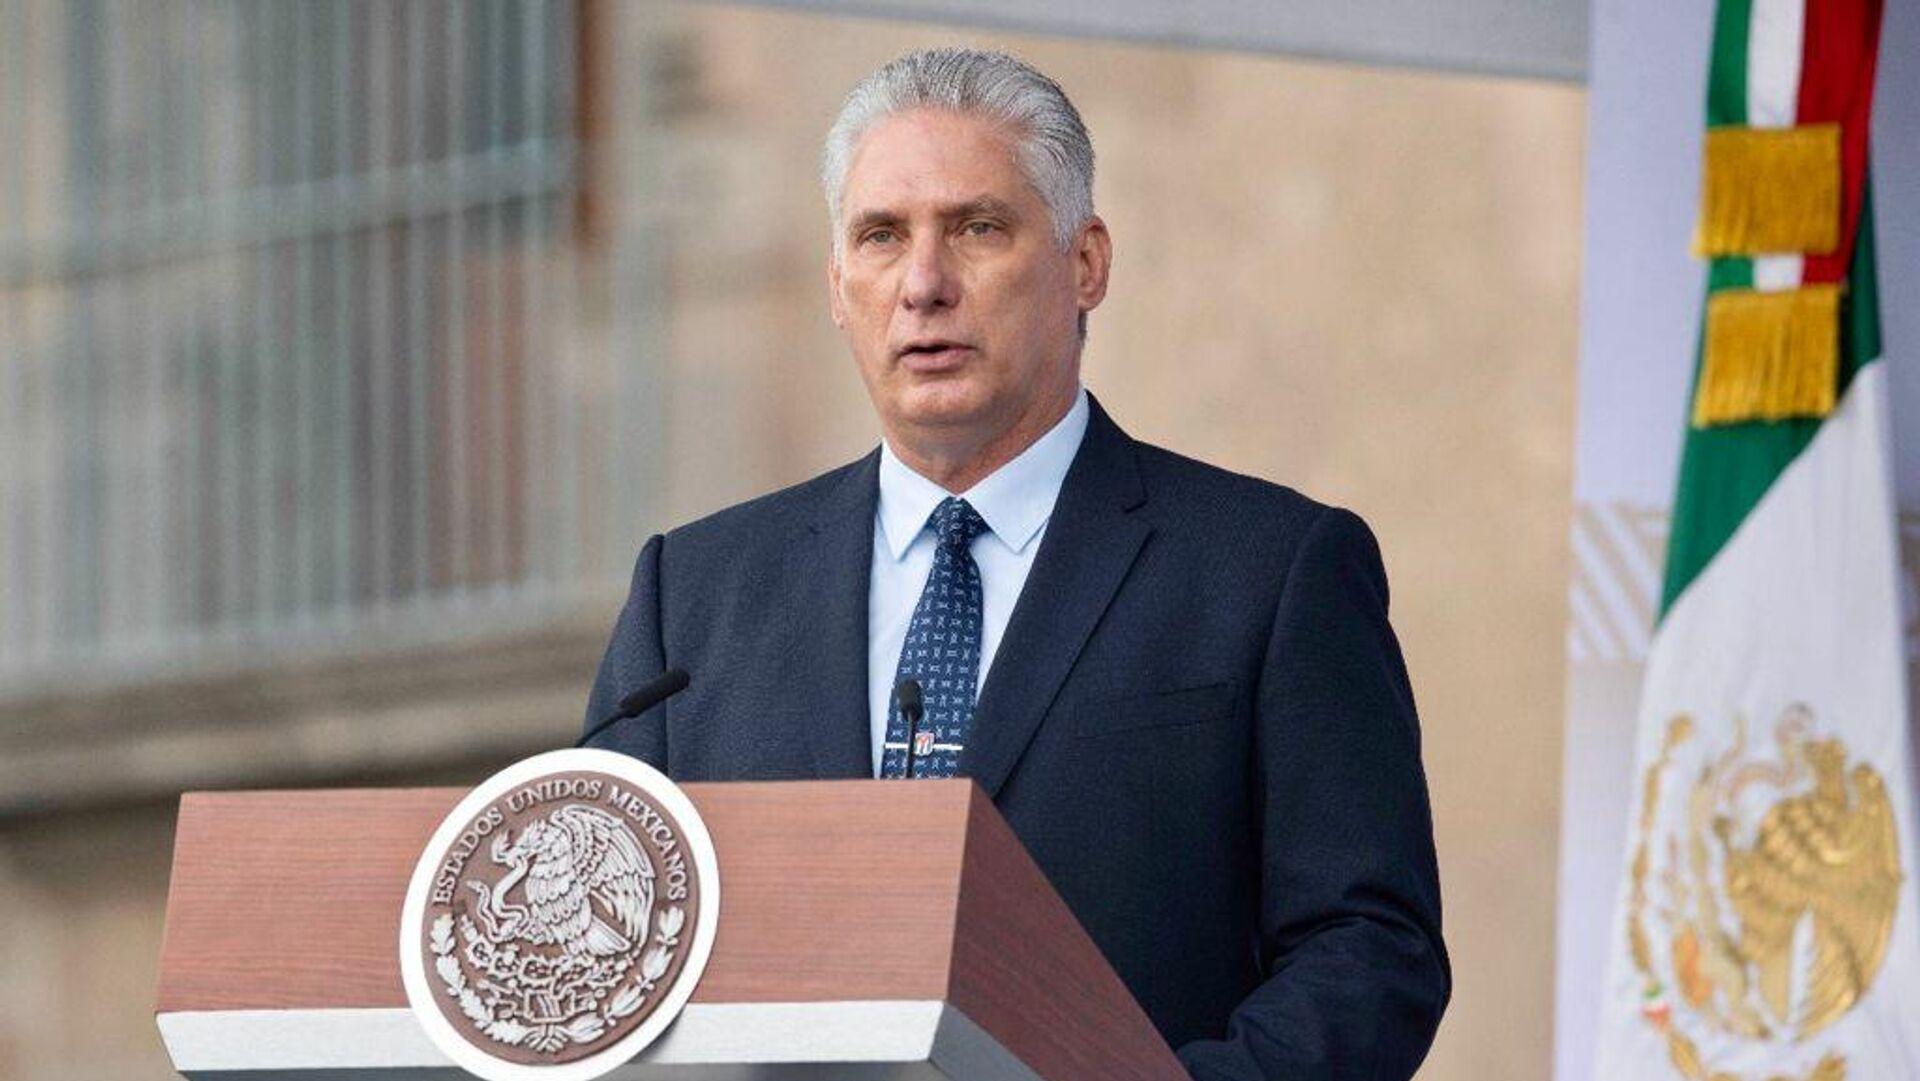 Miguel Díaz-Canel, presidente de Cuba  - Sputnik Mundo, 1920, 16.09.2021